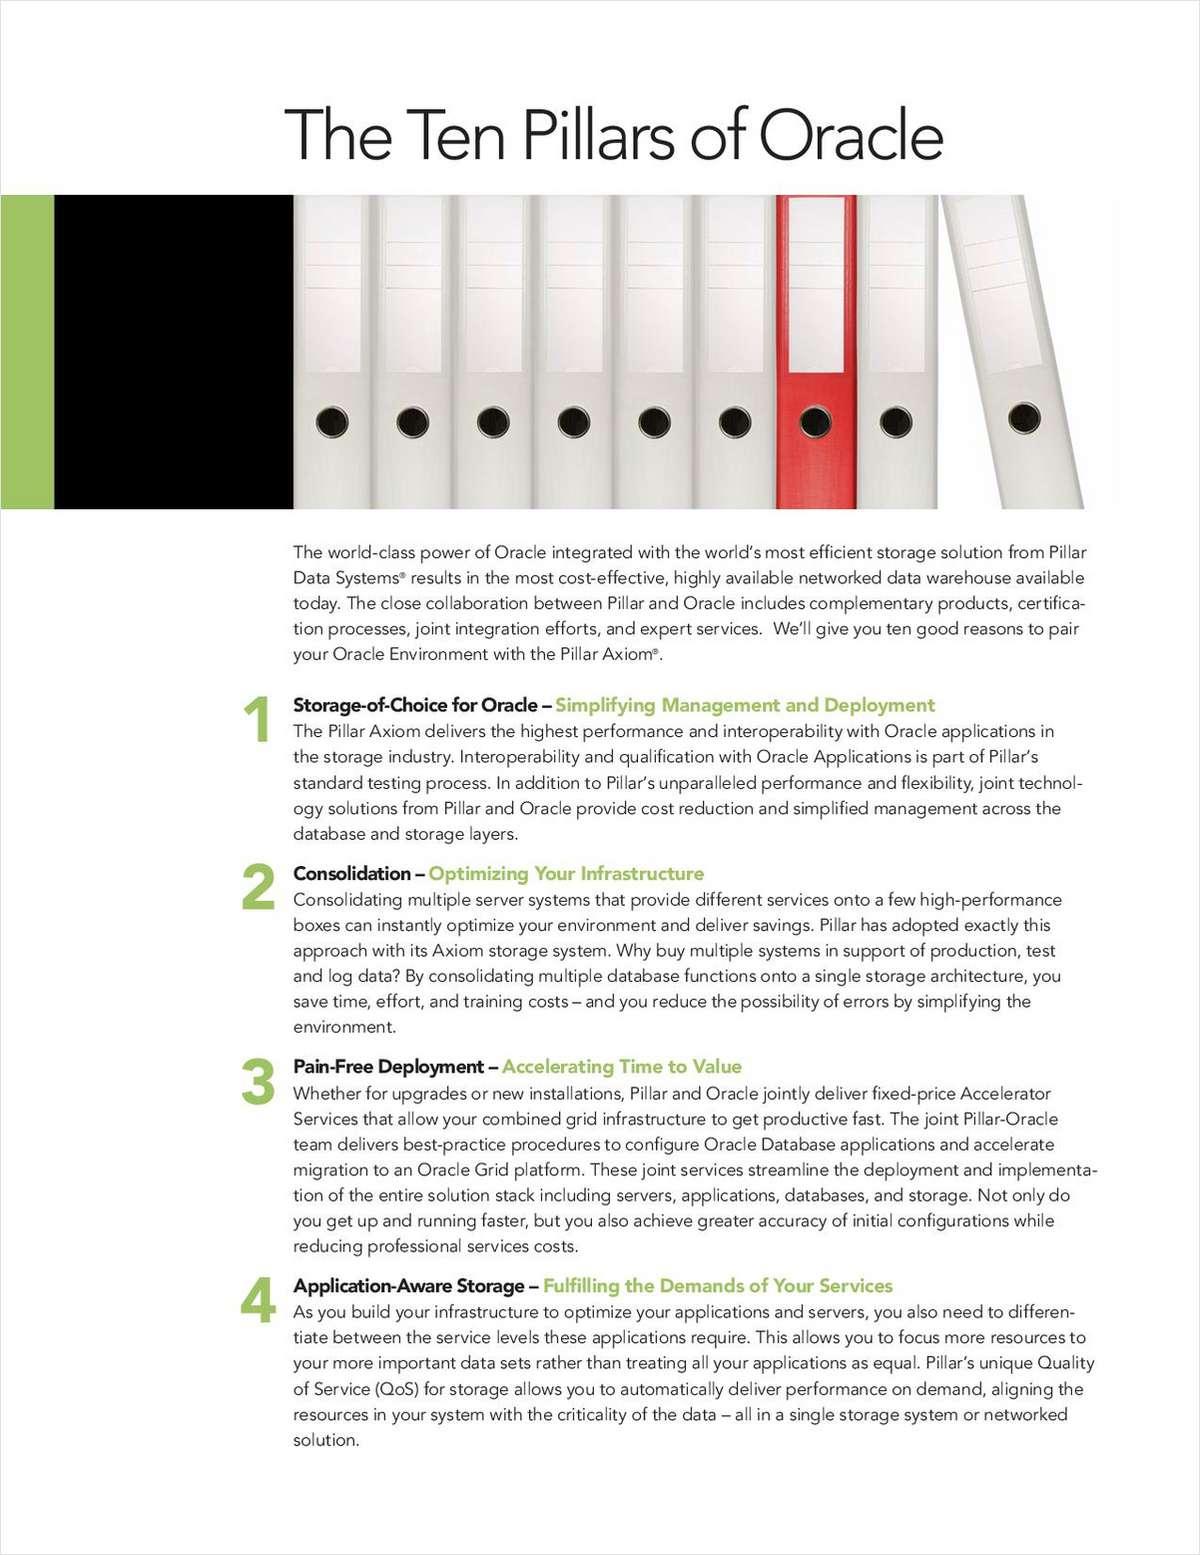 Ten Pillars of Oracle